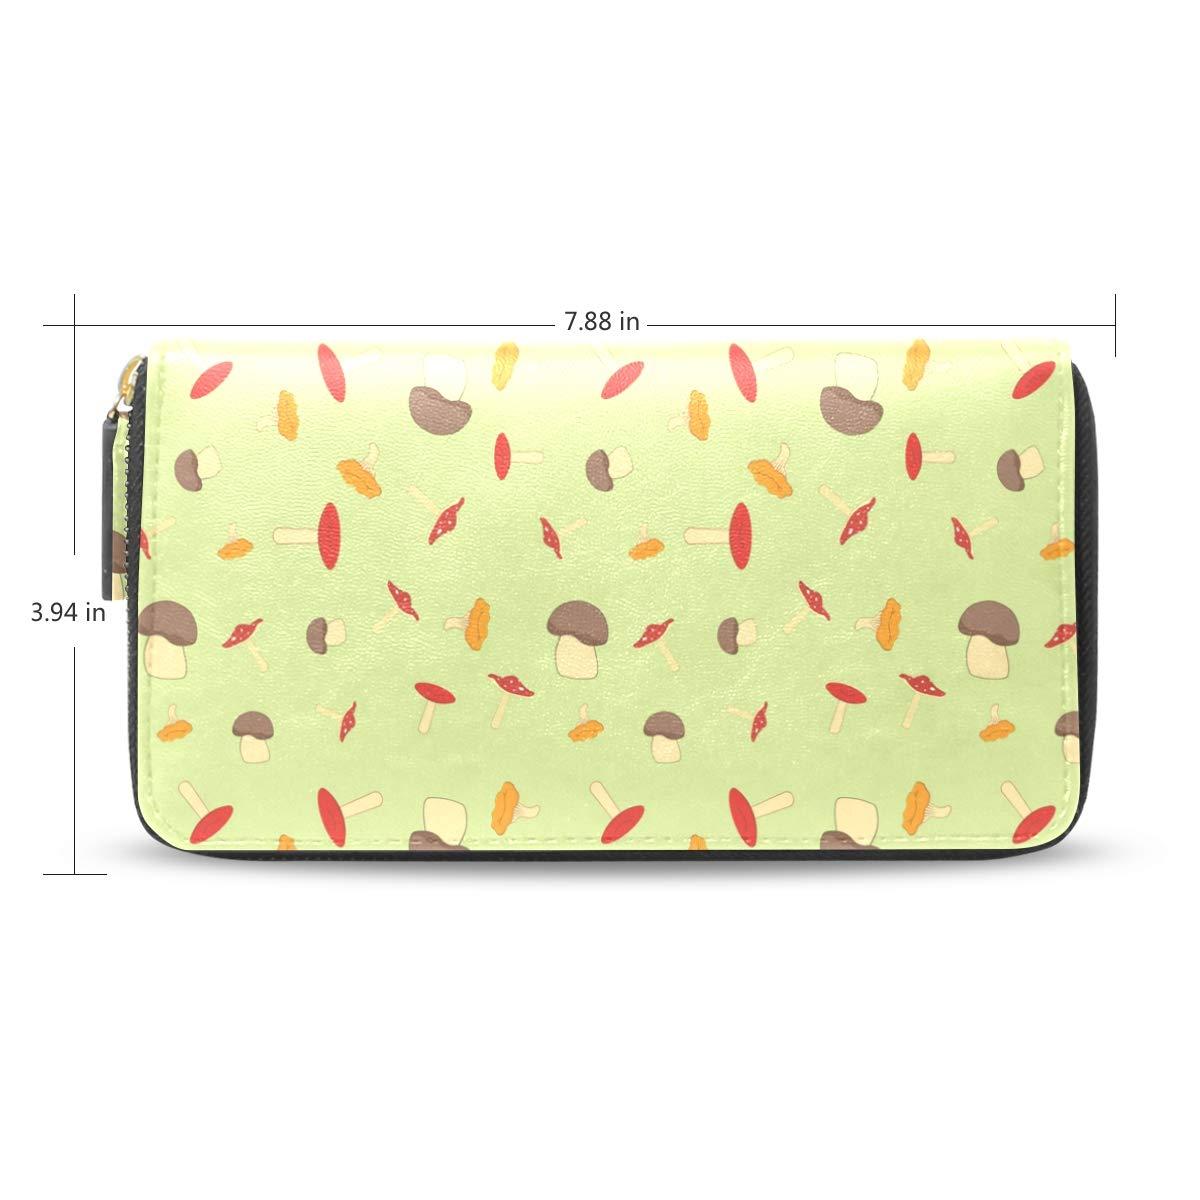 Women Various Mushrooms Yellow Leather Wallet Large Capacity Zipper Travel Wristlet Bags Clutch Cellphone Bag